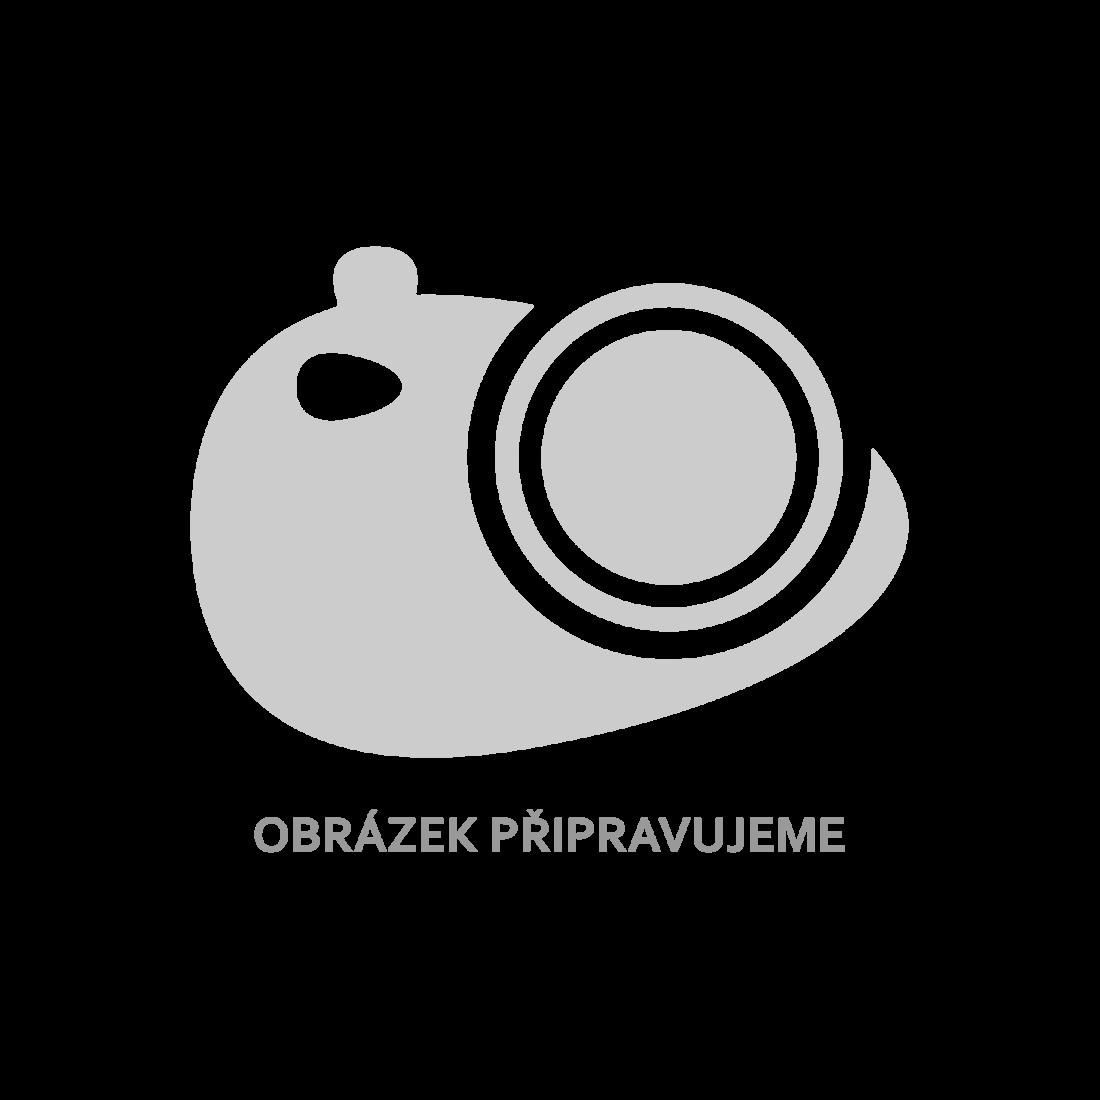 vidaXL Skříňky na CD 2 ks šedé 21 x 16 x 93,5 cm dřevotříska [802698]